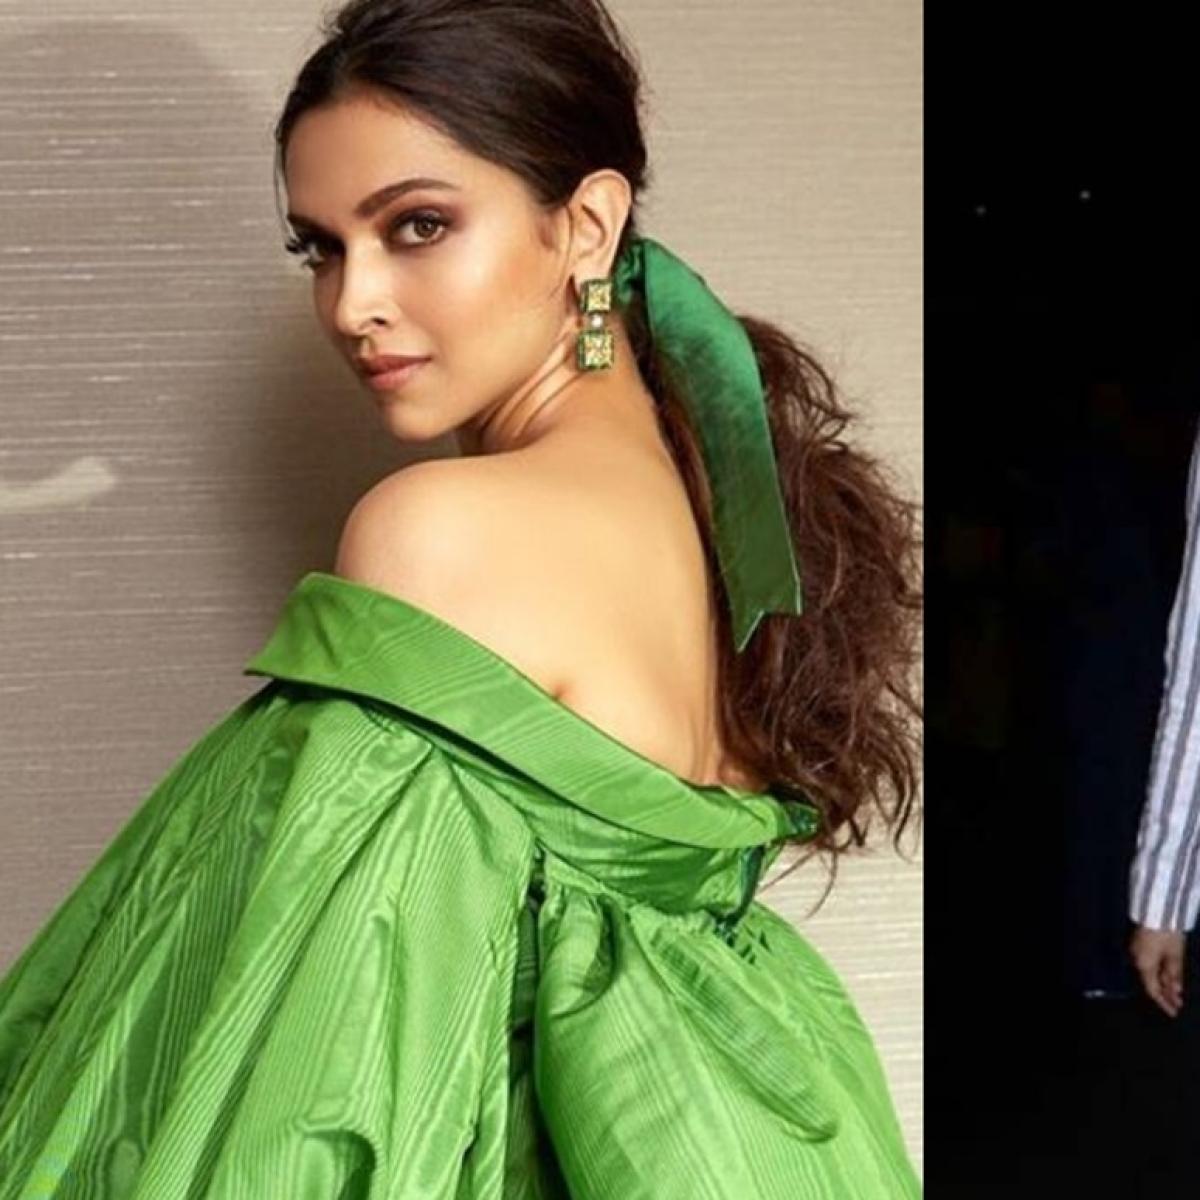 Deepika Padukone to replace Kangana Ranaut in Anurag Basu's 'Imali'?